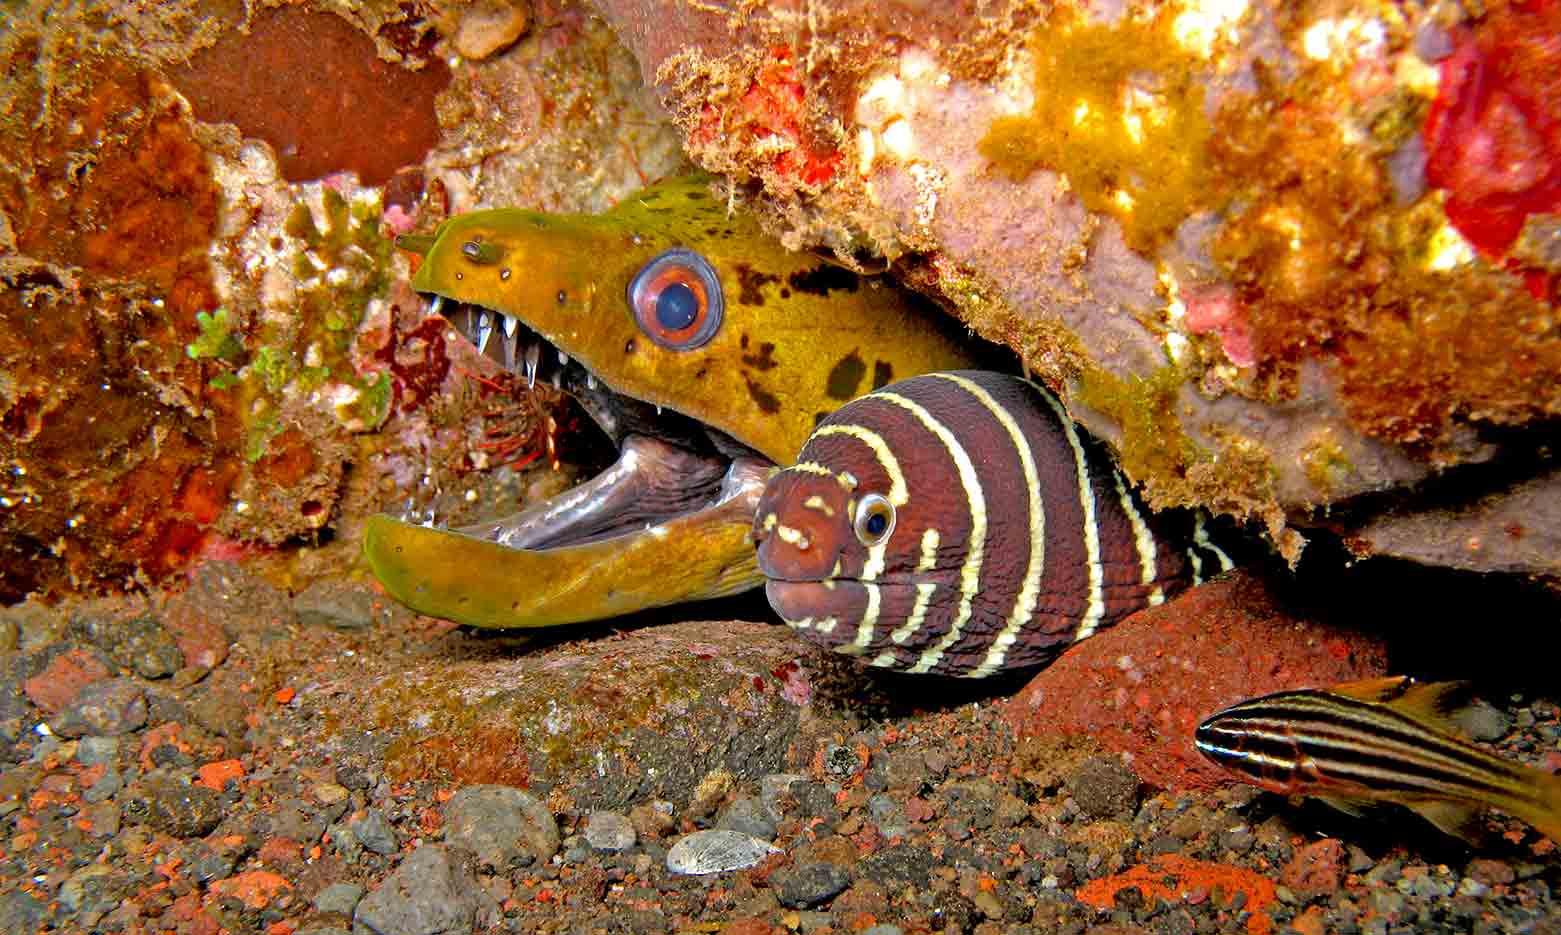 Gili-Trawangan-Lombok-Activities-Activity-Scuba-Scubadive-Scubadiving-Dive-Diving-71.jpg